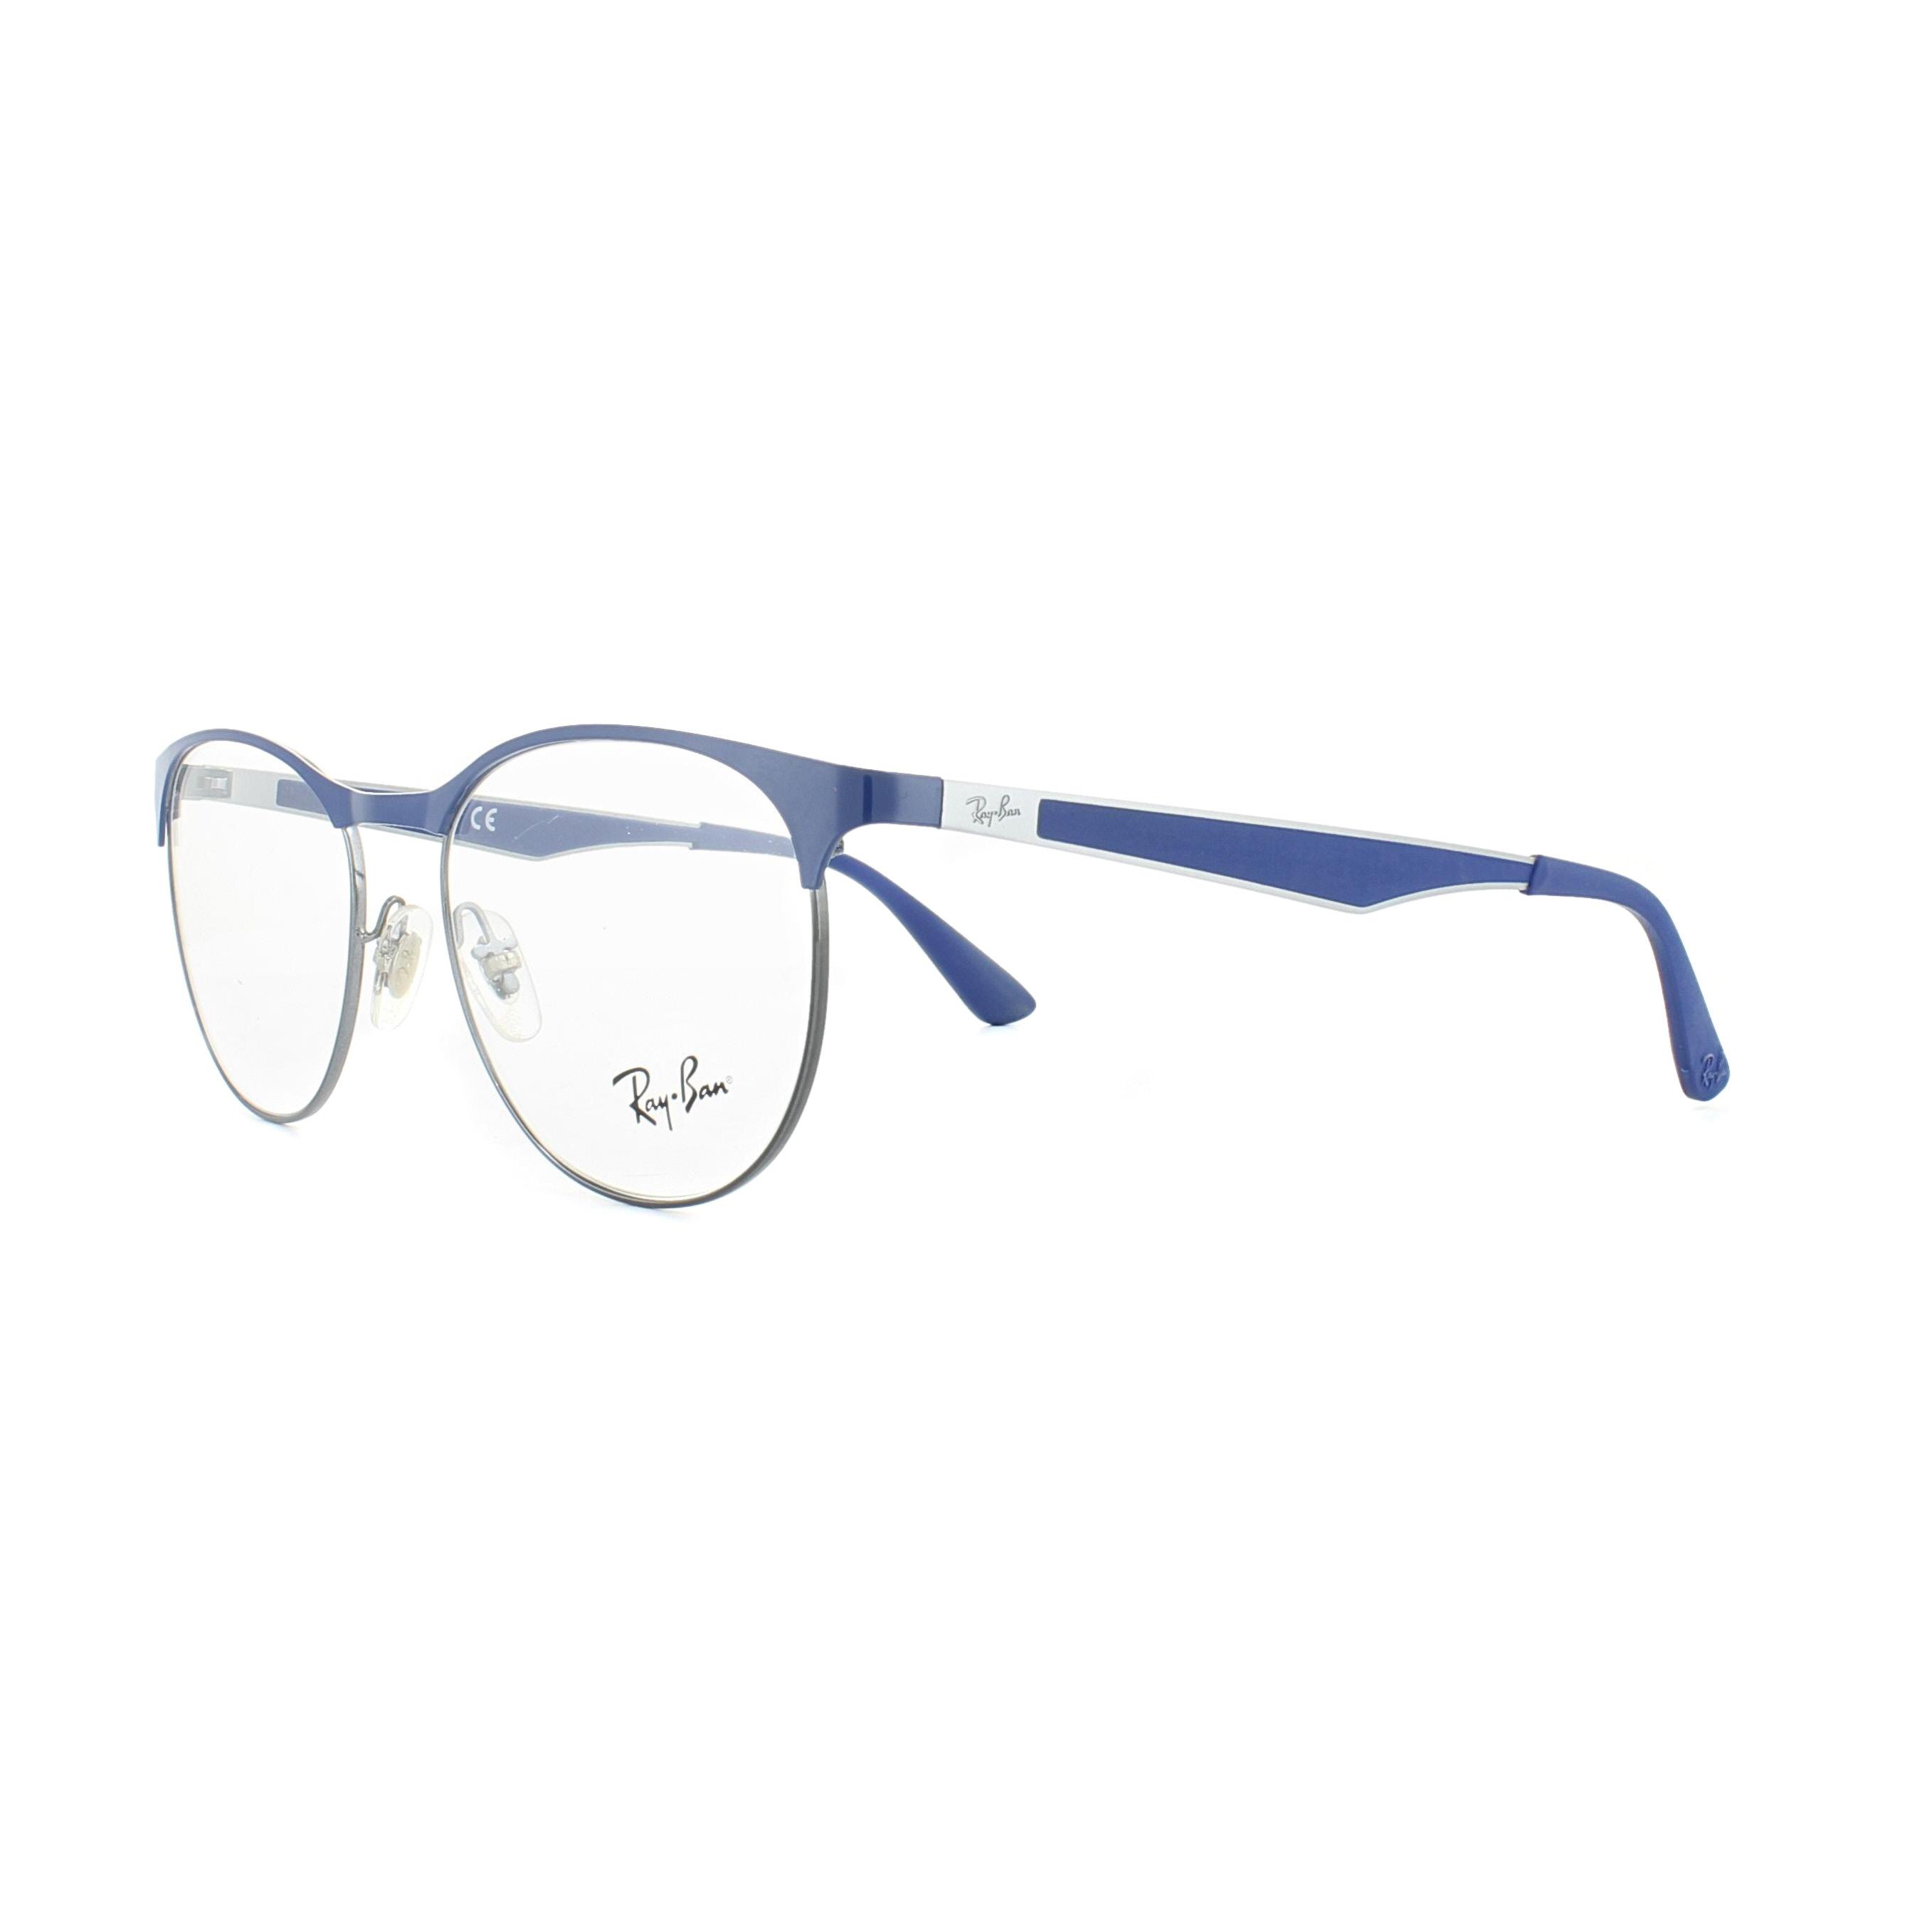 f88436f91d ... australia sentinel ray ban glasses frames 6365 2889 gunmetal electric blue  51mm womens d34a4 cc02e ...